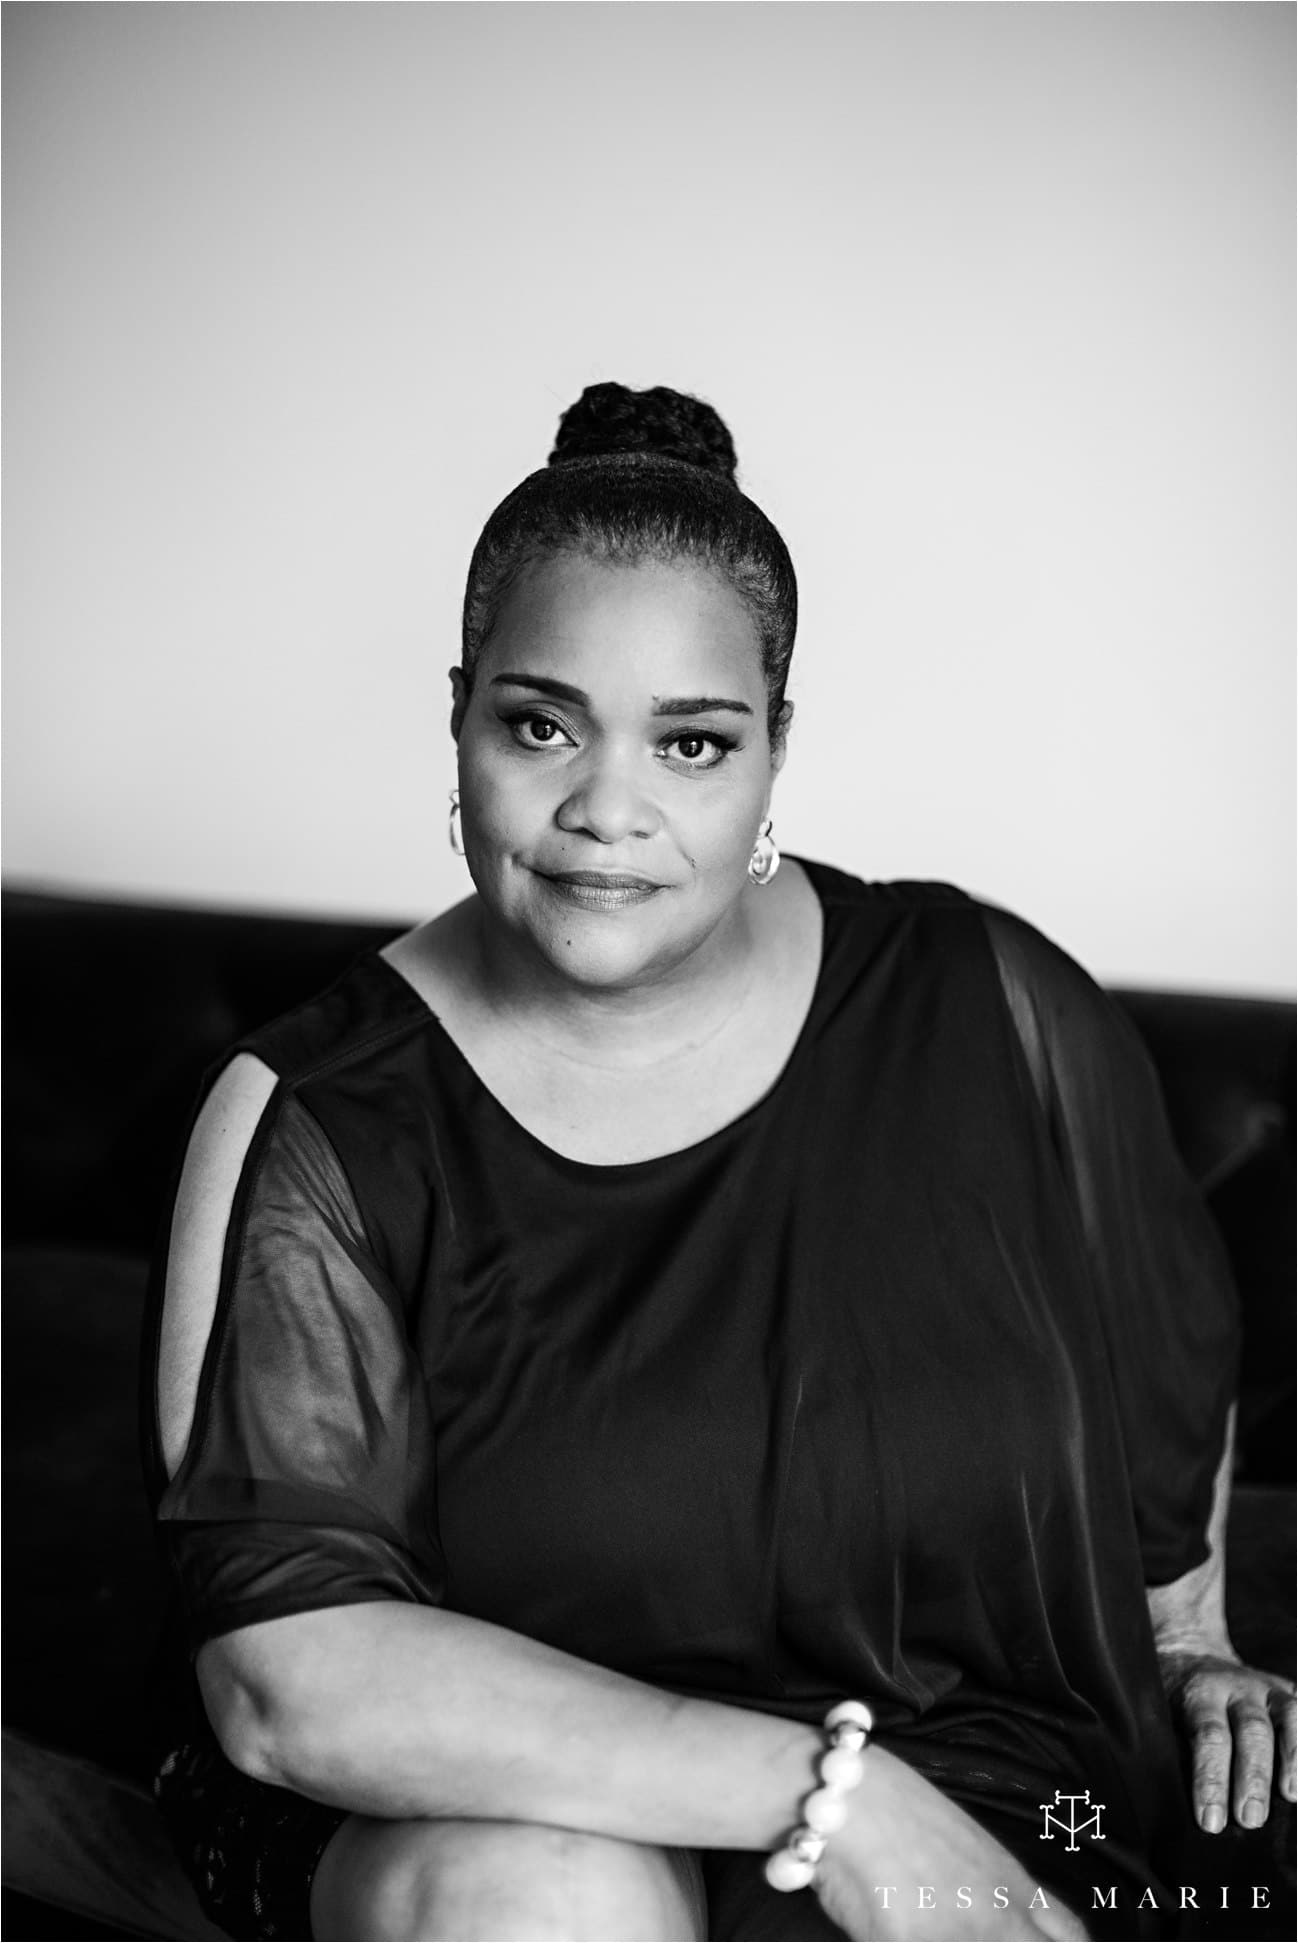 Tessa_marie_studios_womens_headshots_portraits_empowering_full_experience_something_for_mom_0035